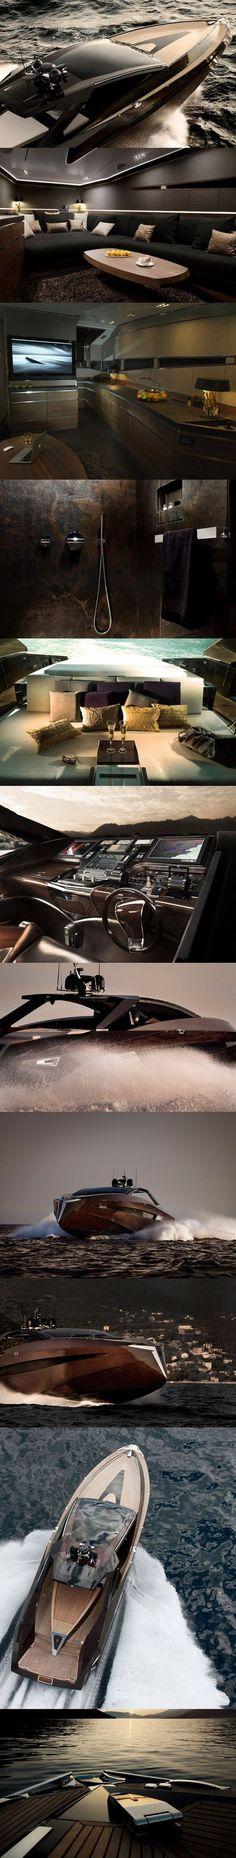 Art of Kinetik Hedonist Yacht; my next boat. Yacht Design, Boat Design, Super Yachts, Bateau Yacht, Luxury Sailing Yachts, R1200r, Yacht Interior, Interior Design, Yacht Boat